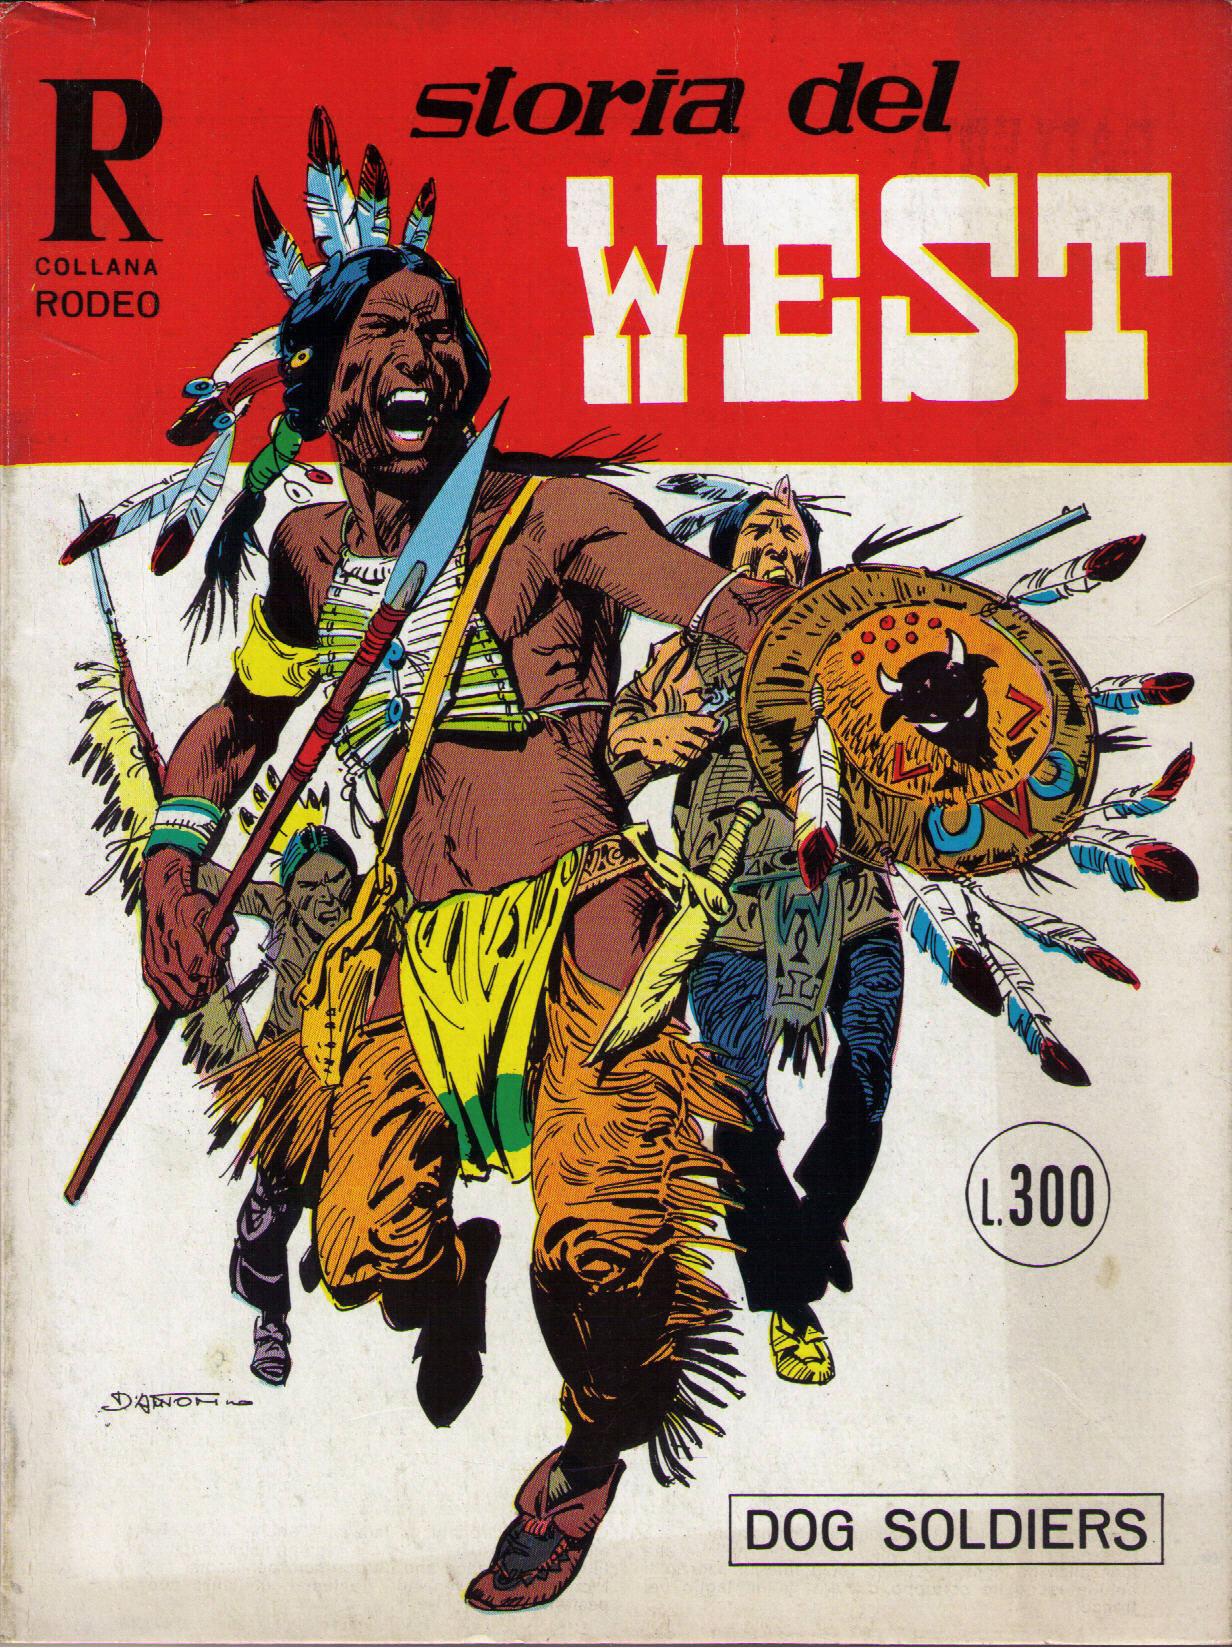 Storia del West n. 38 (Collana Rodeo n. 87)